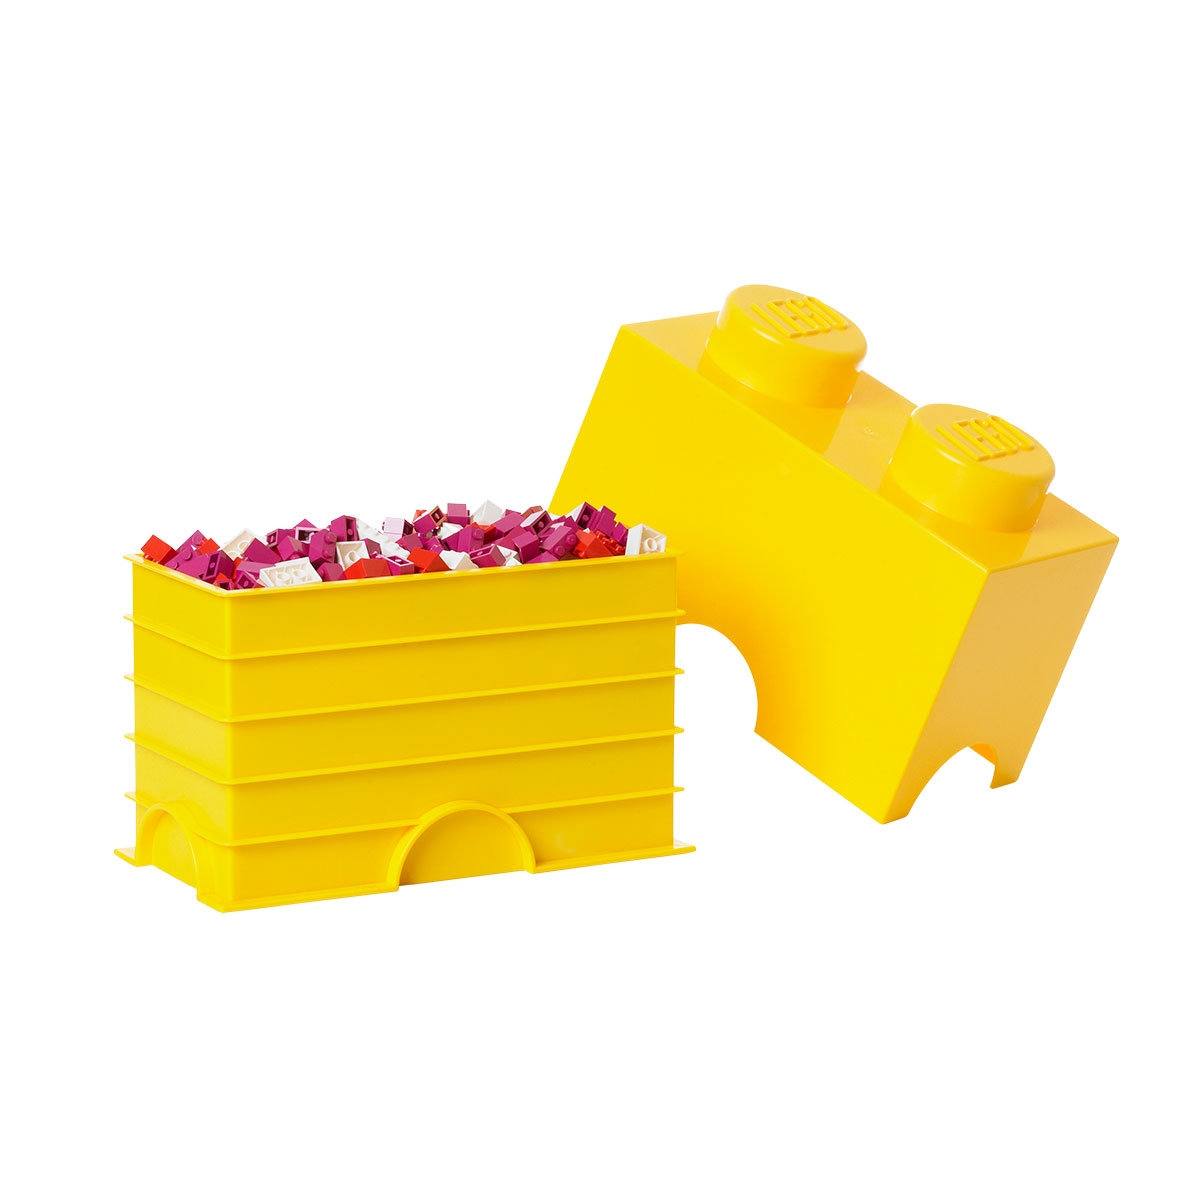 ranger avec lego est un jeu d enfants. Black Bedroom Furniture Sets. Home Design Ideas